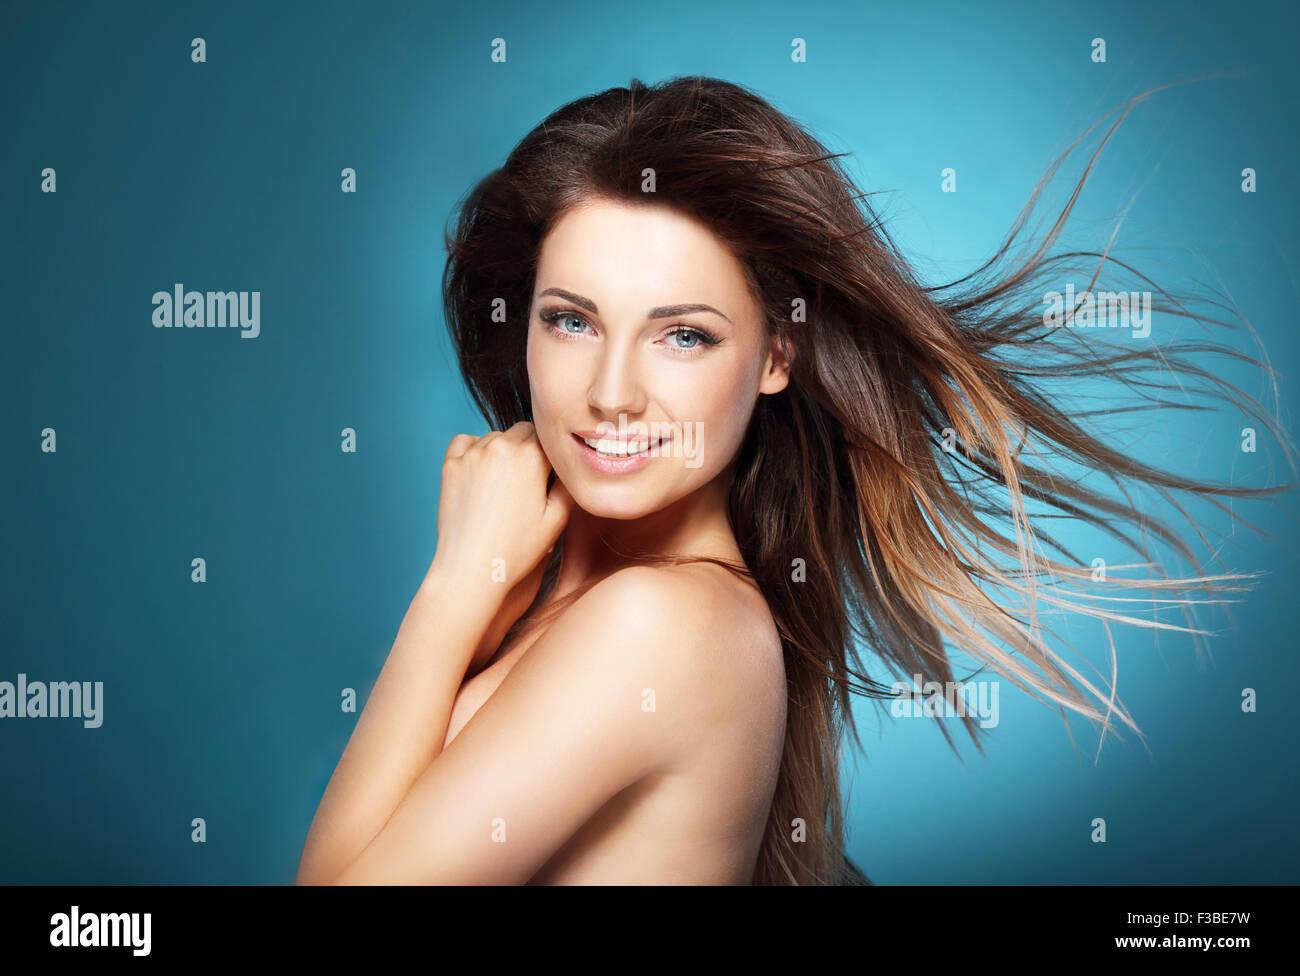 Mujer sobre fondo azul. Imagen De Stock